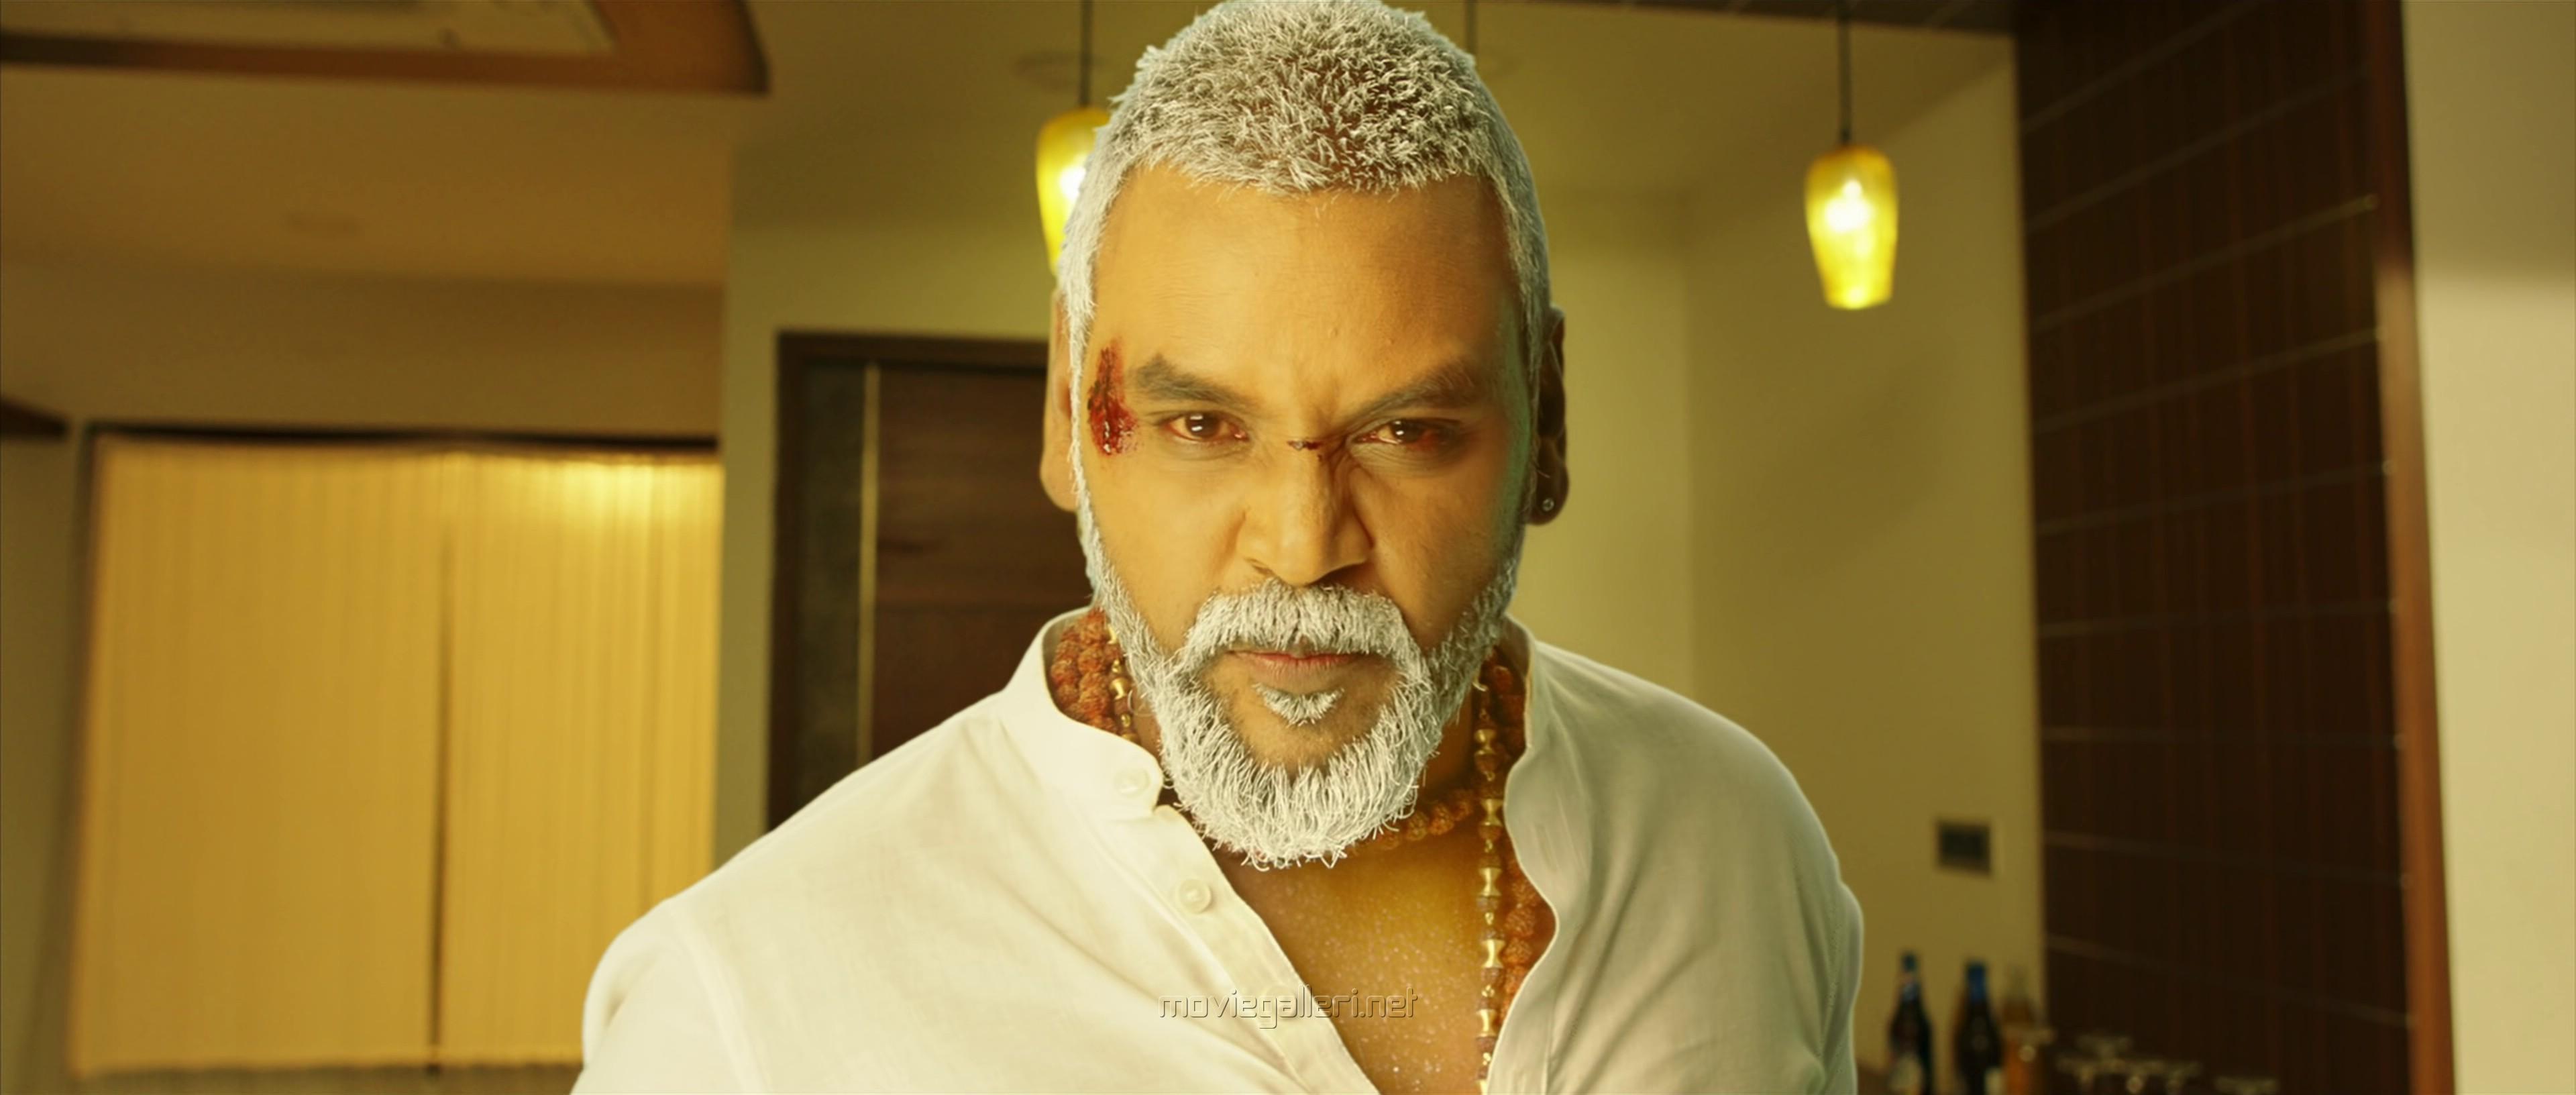 Actor Raghava Lawrence in Kanchana 3 Movie New Pics HD